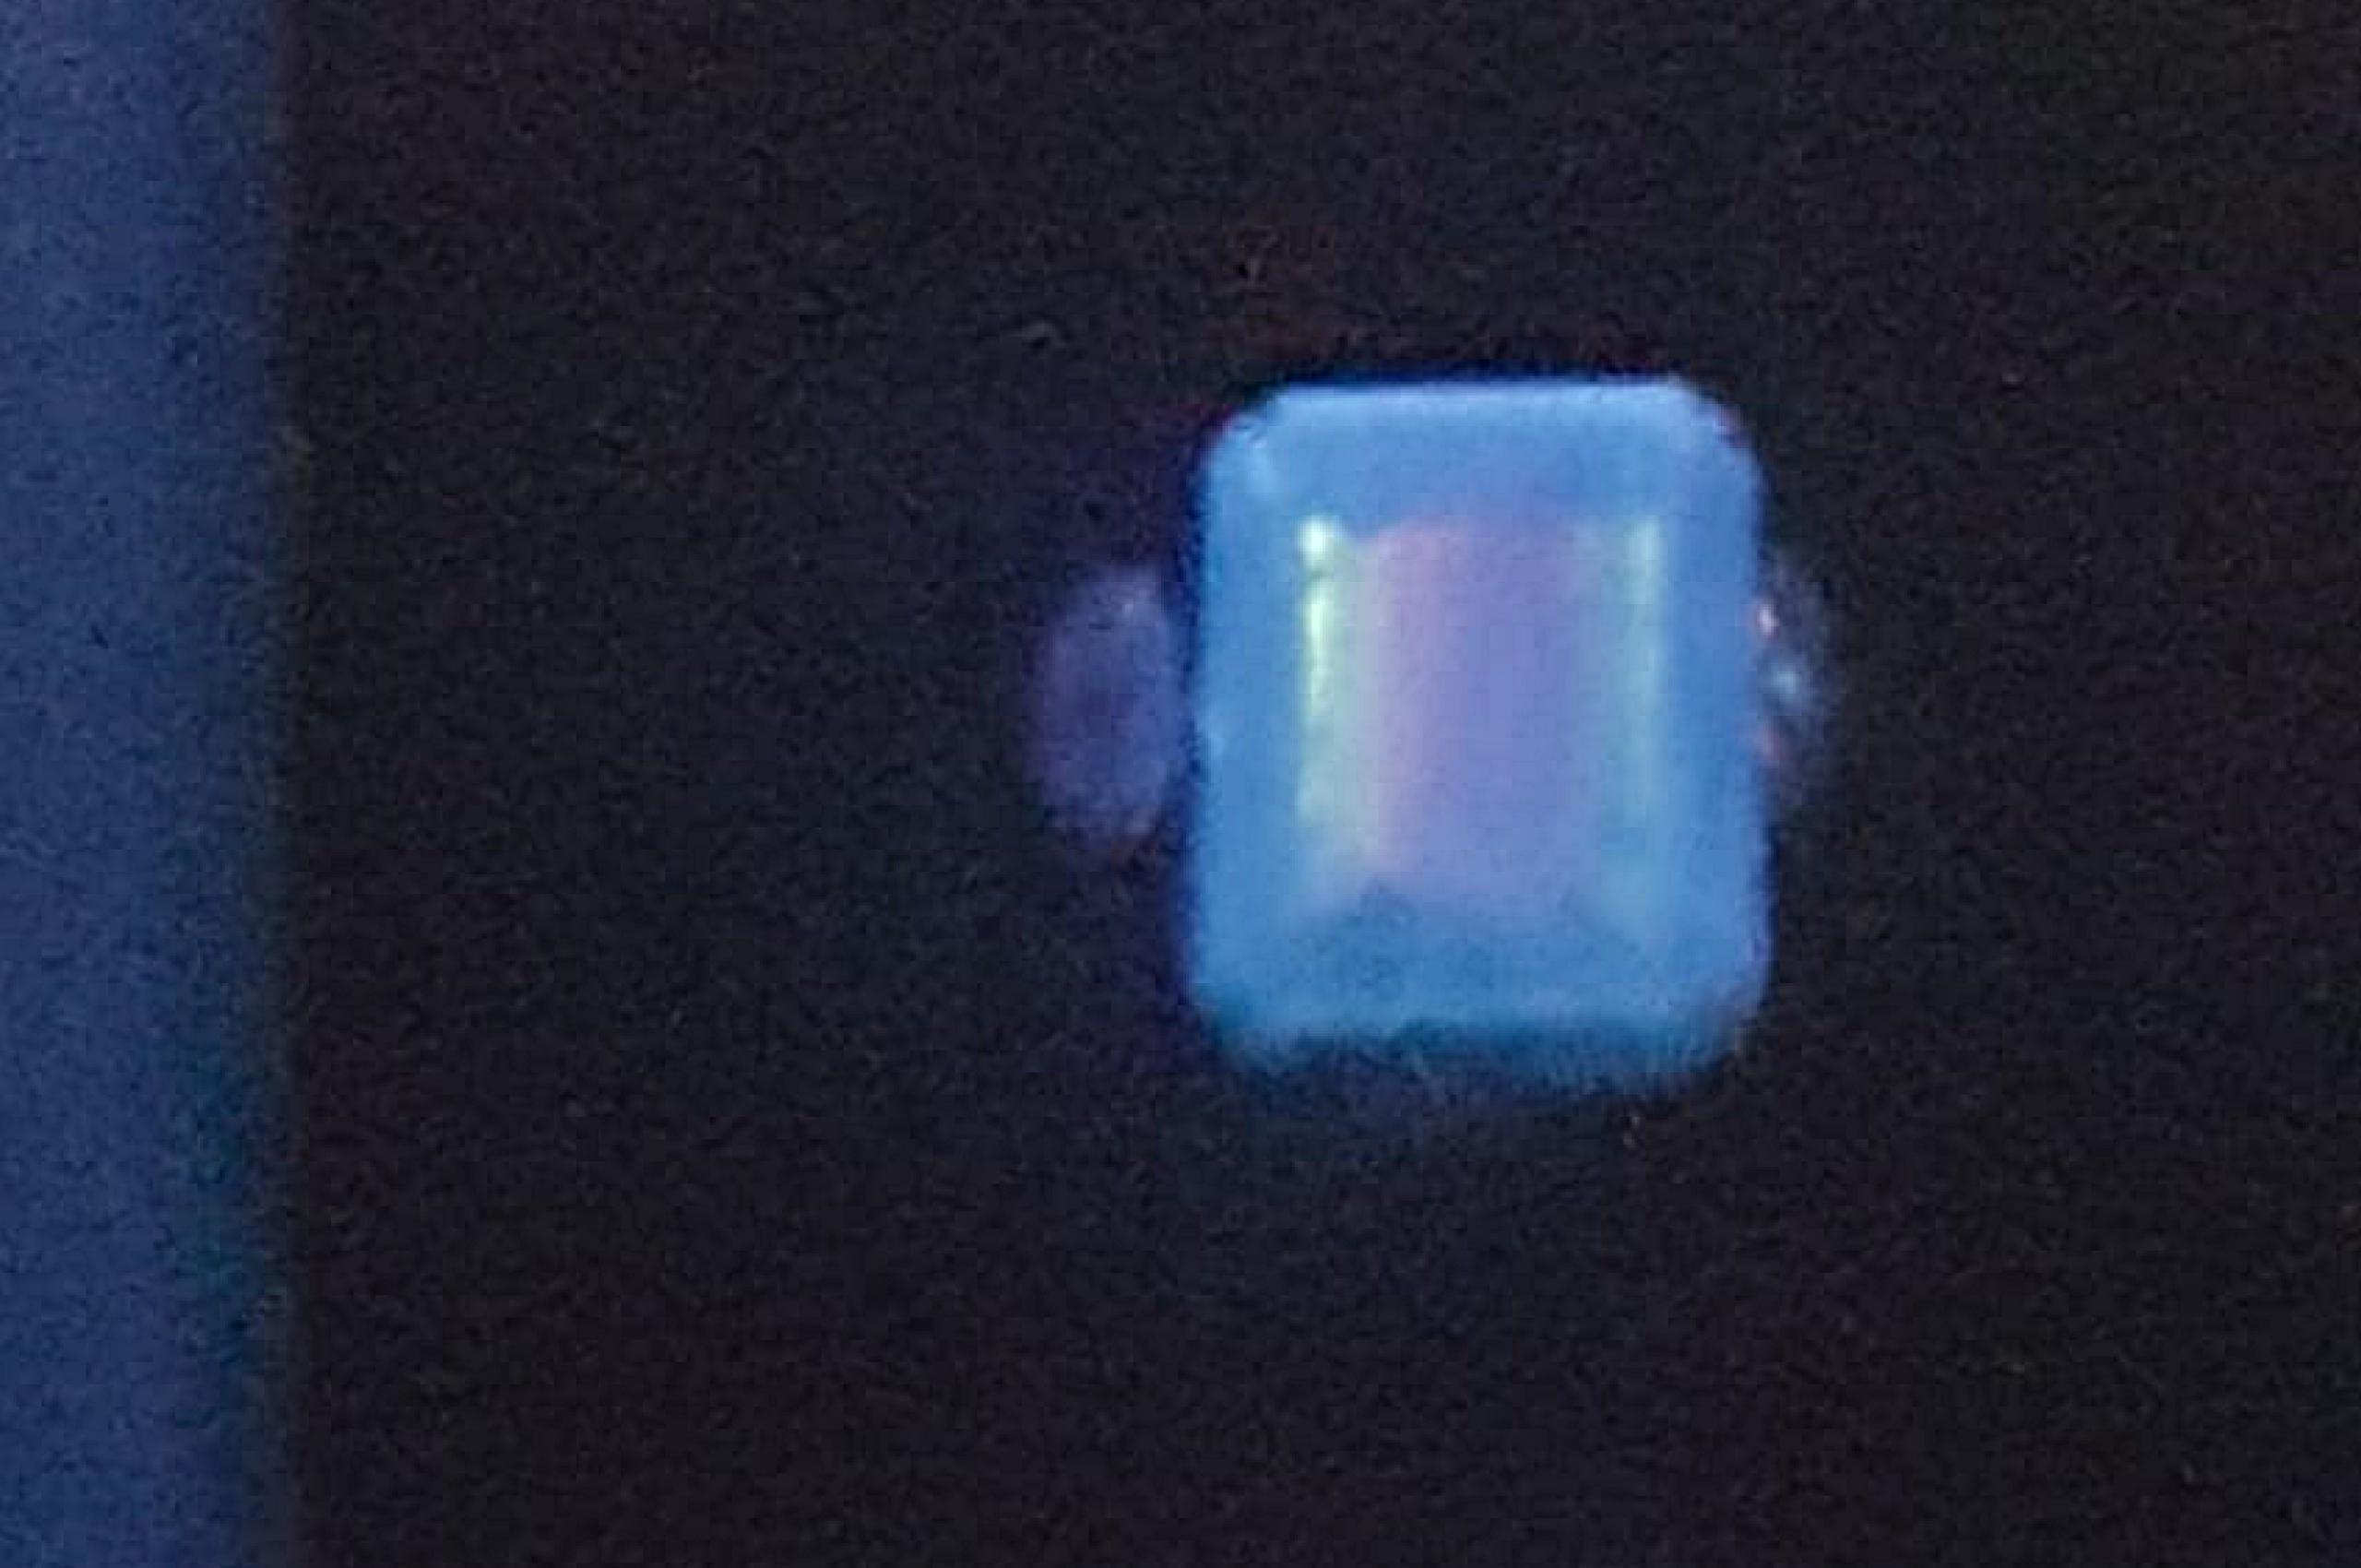 Glass, Imitation of Emerald, Short wave fluorescence. Photo by Fausta Aidala